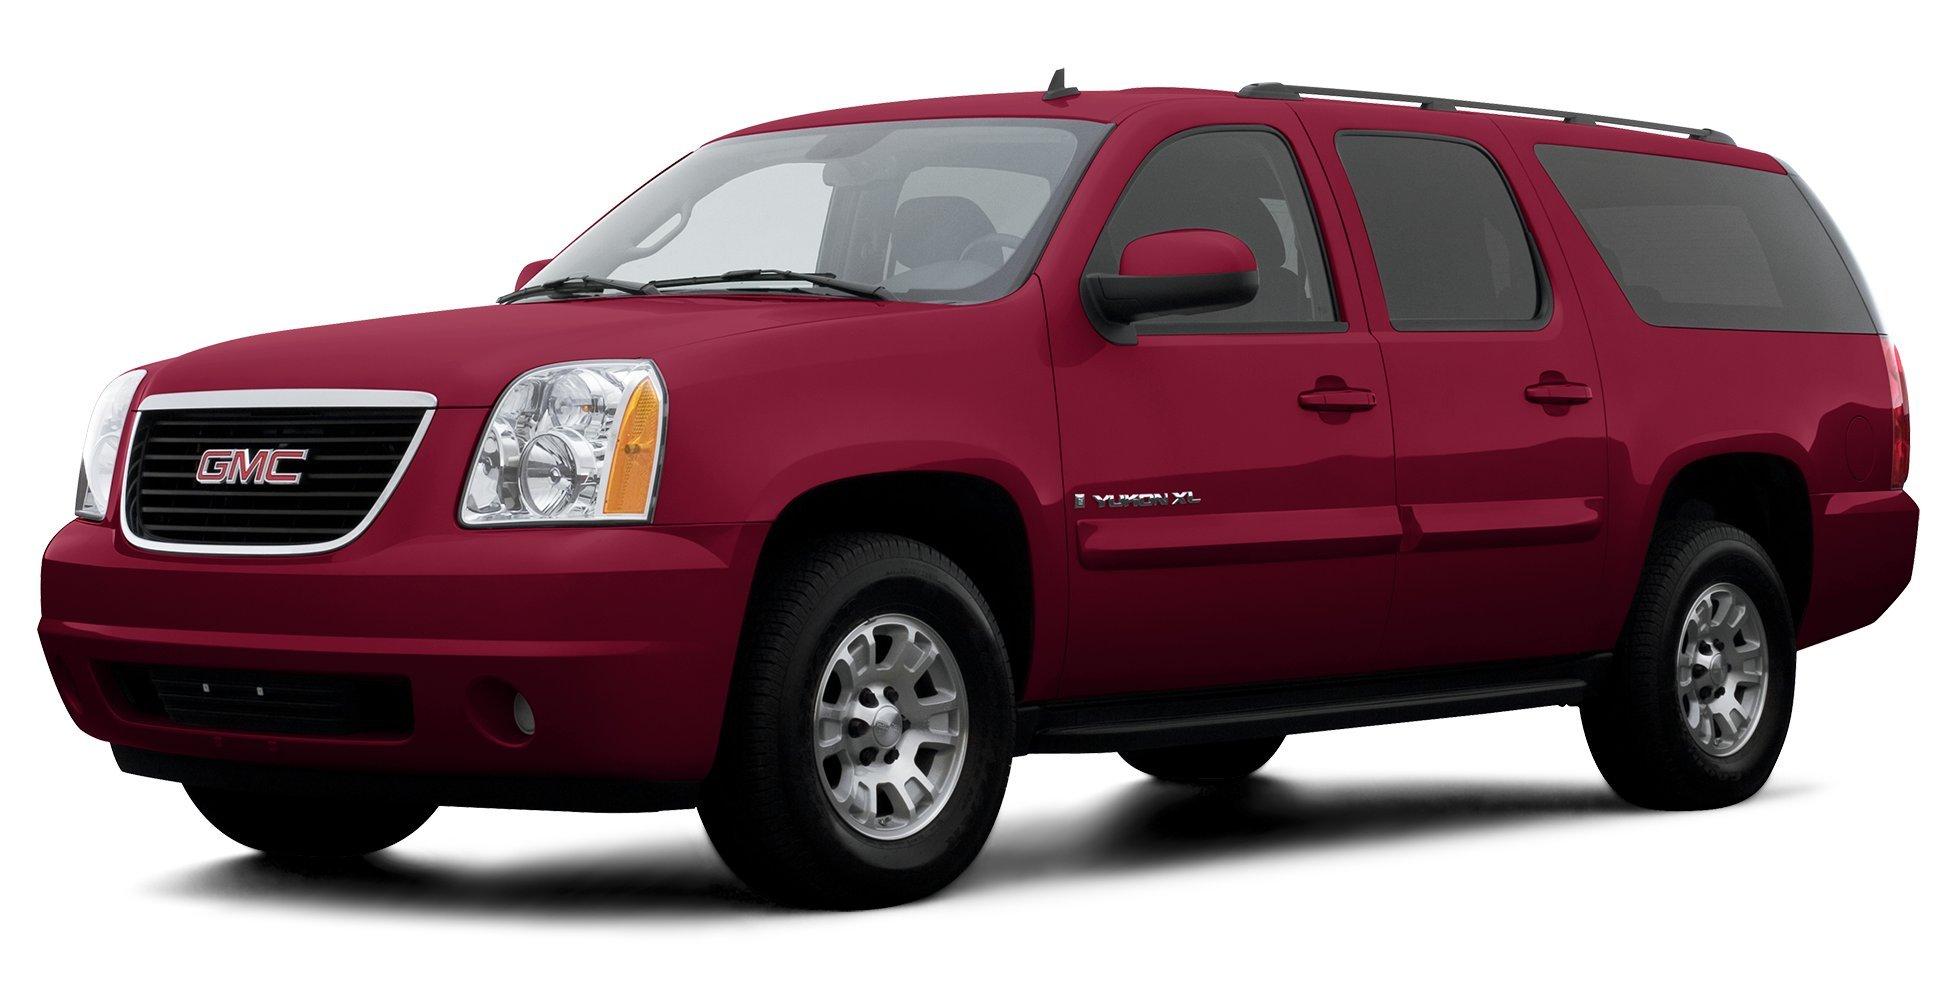 2007 Jeep Commander New 2012 Dodge Caravan And Chrysler Town Country 36 Fuse Box Gmc Yukon Xl 1500 Slt 2 Wheel Drive 4 Door